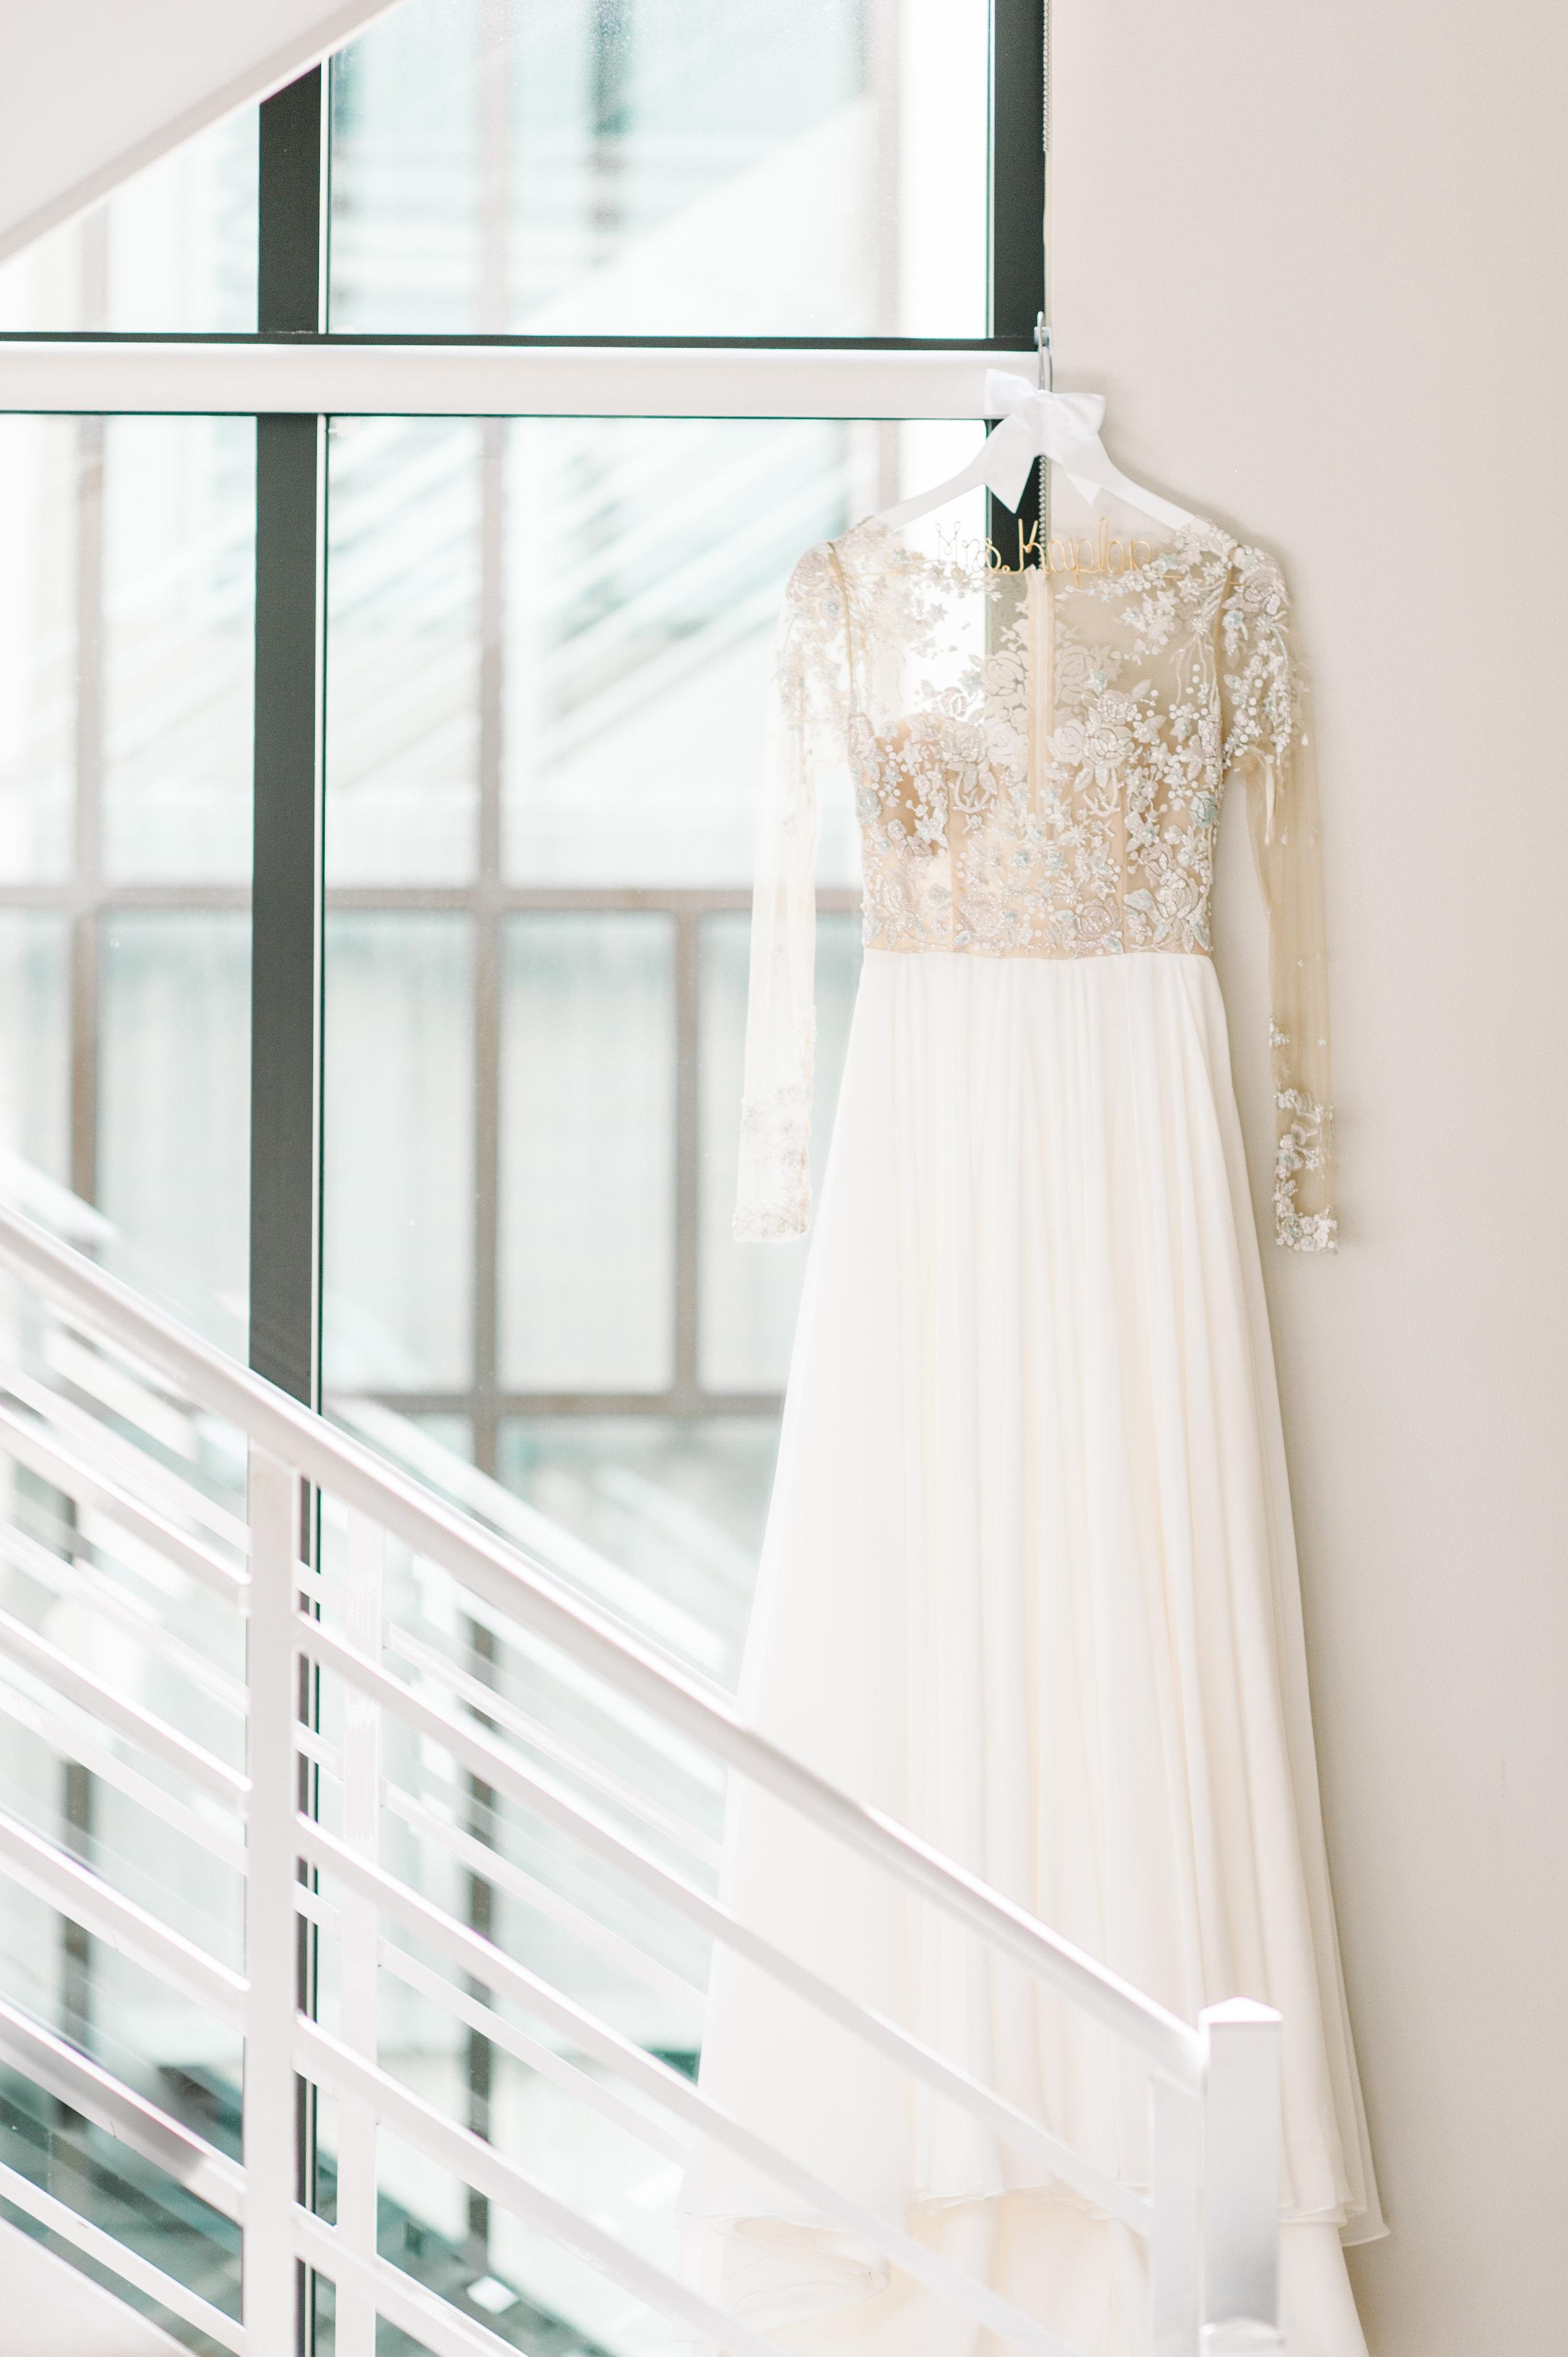 Dress REC_7470.jpg